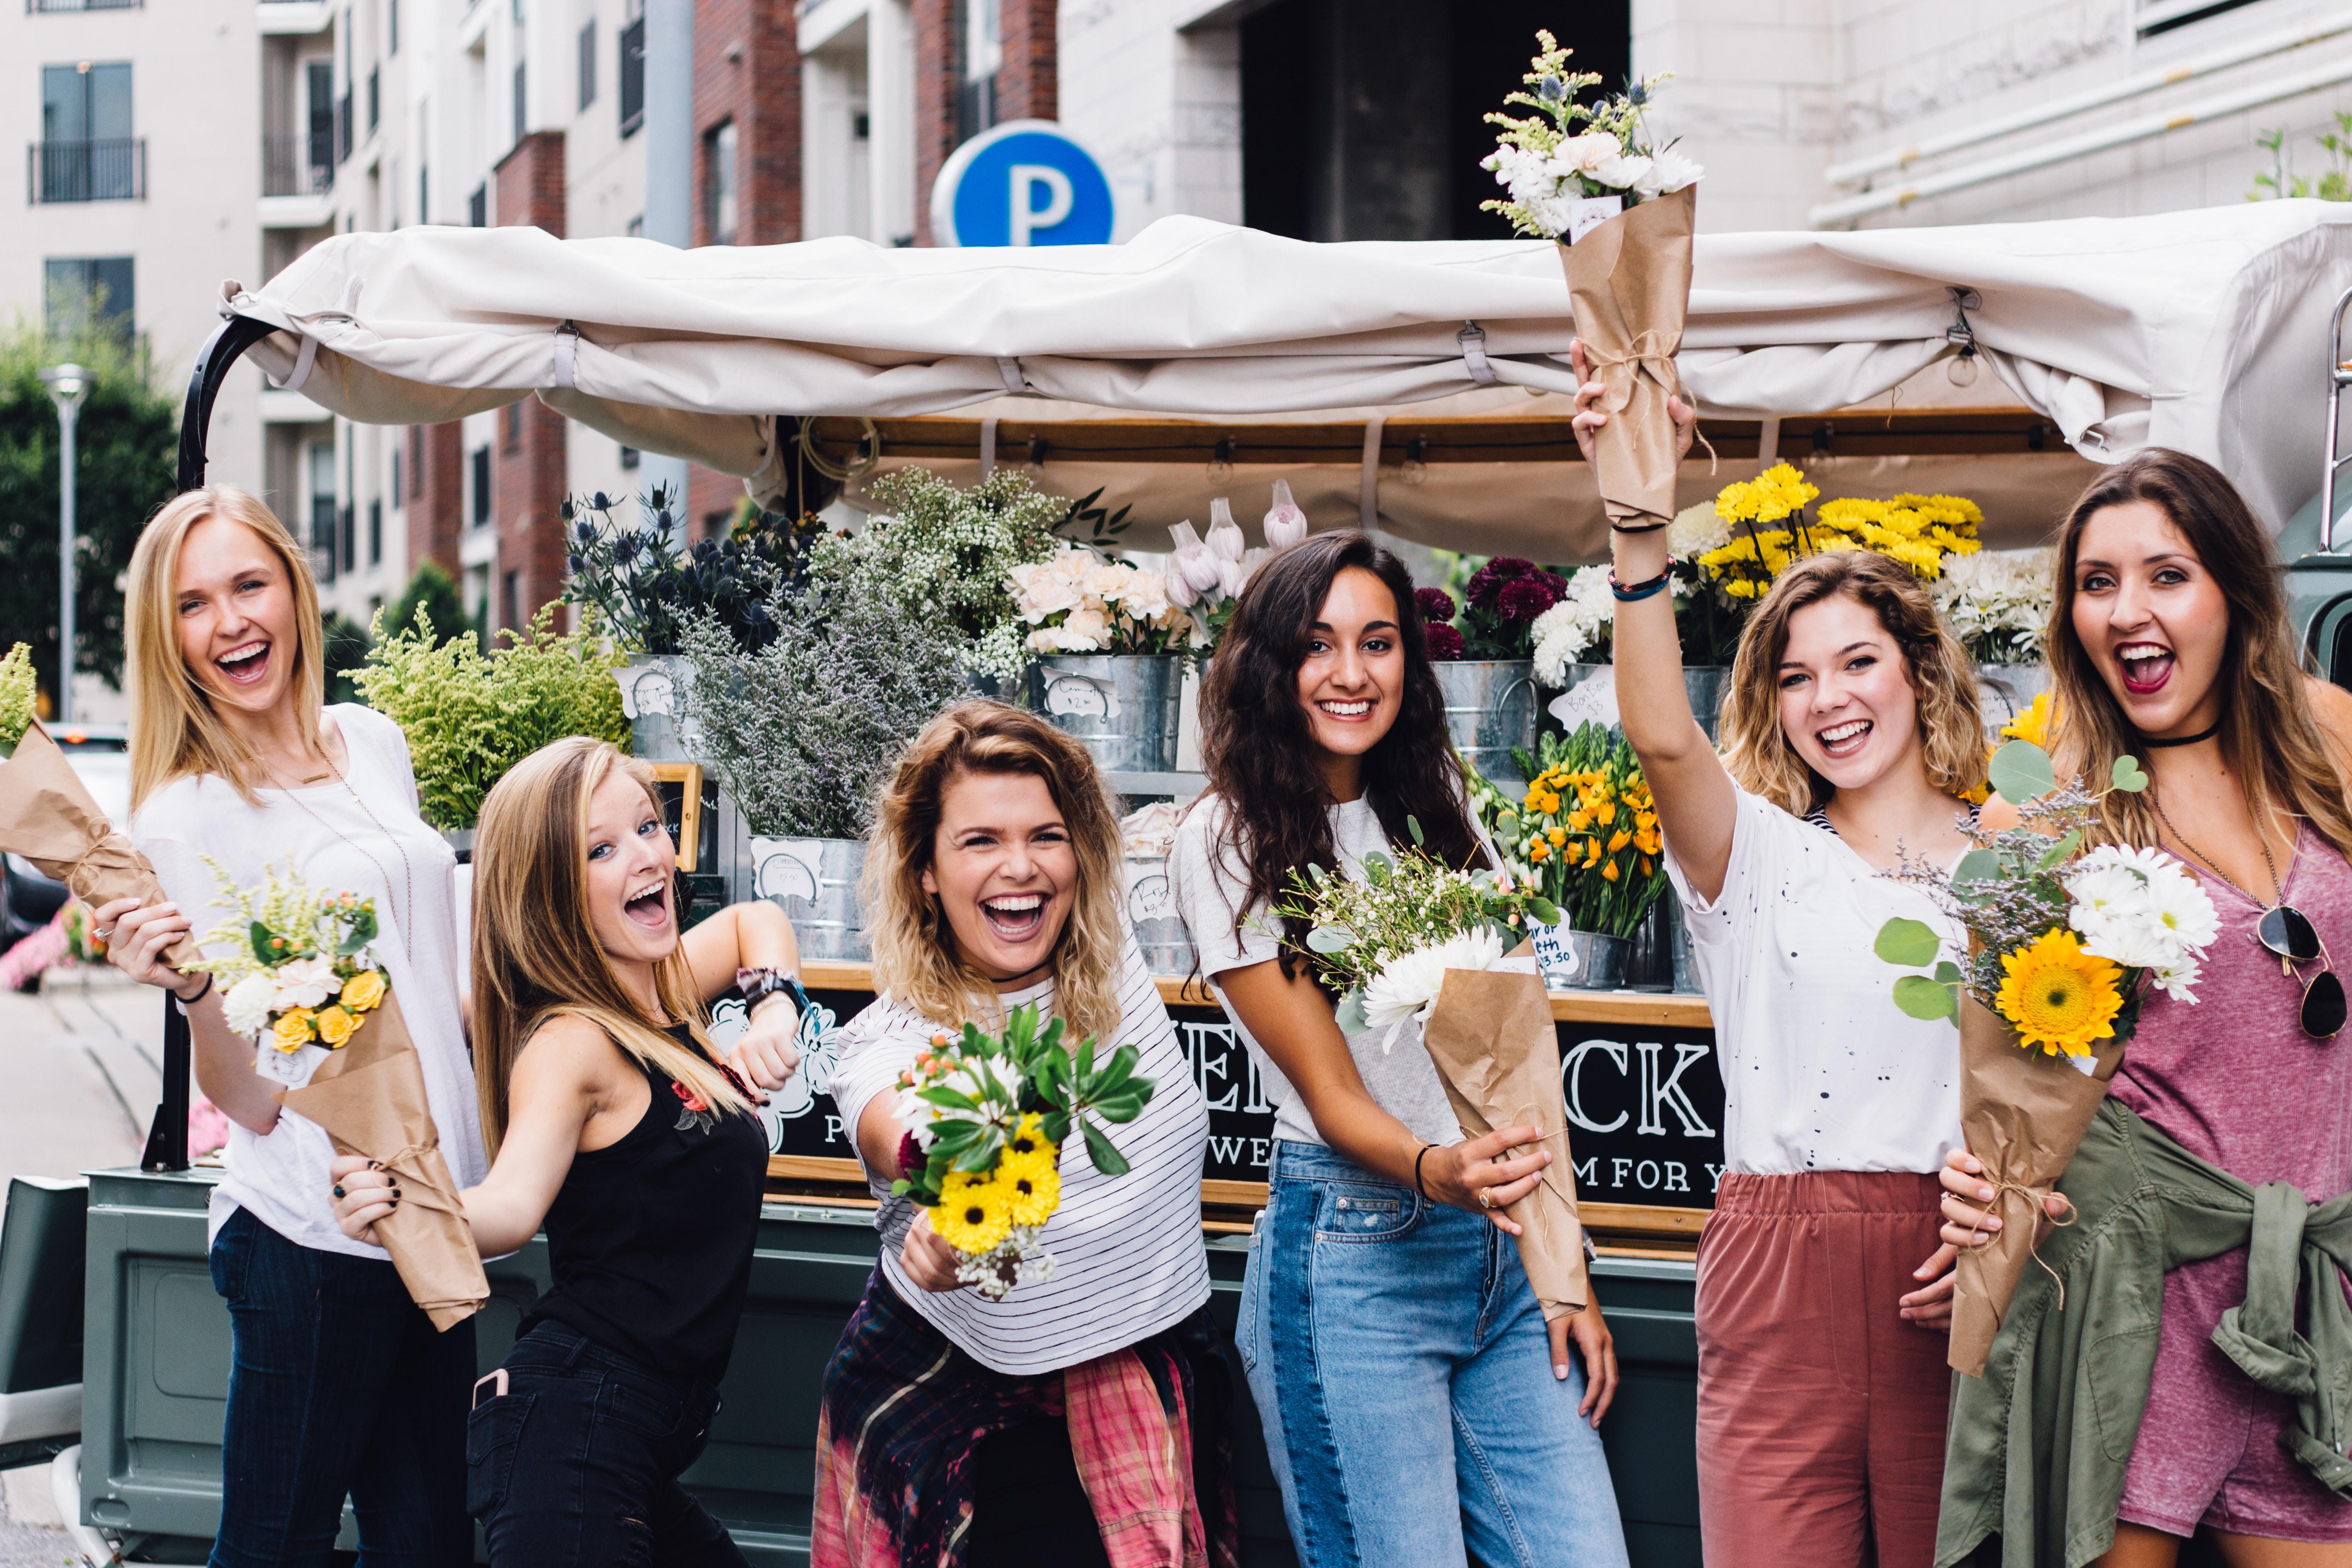 group of women holding flower bouquet beside flower vendor